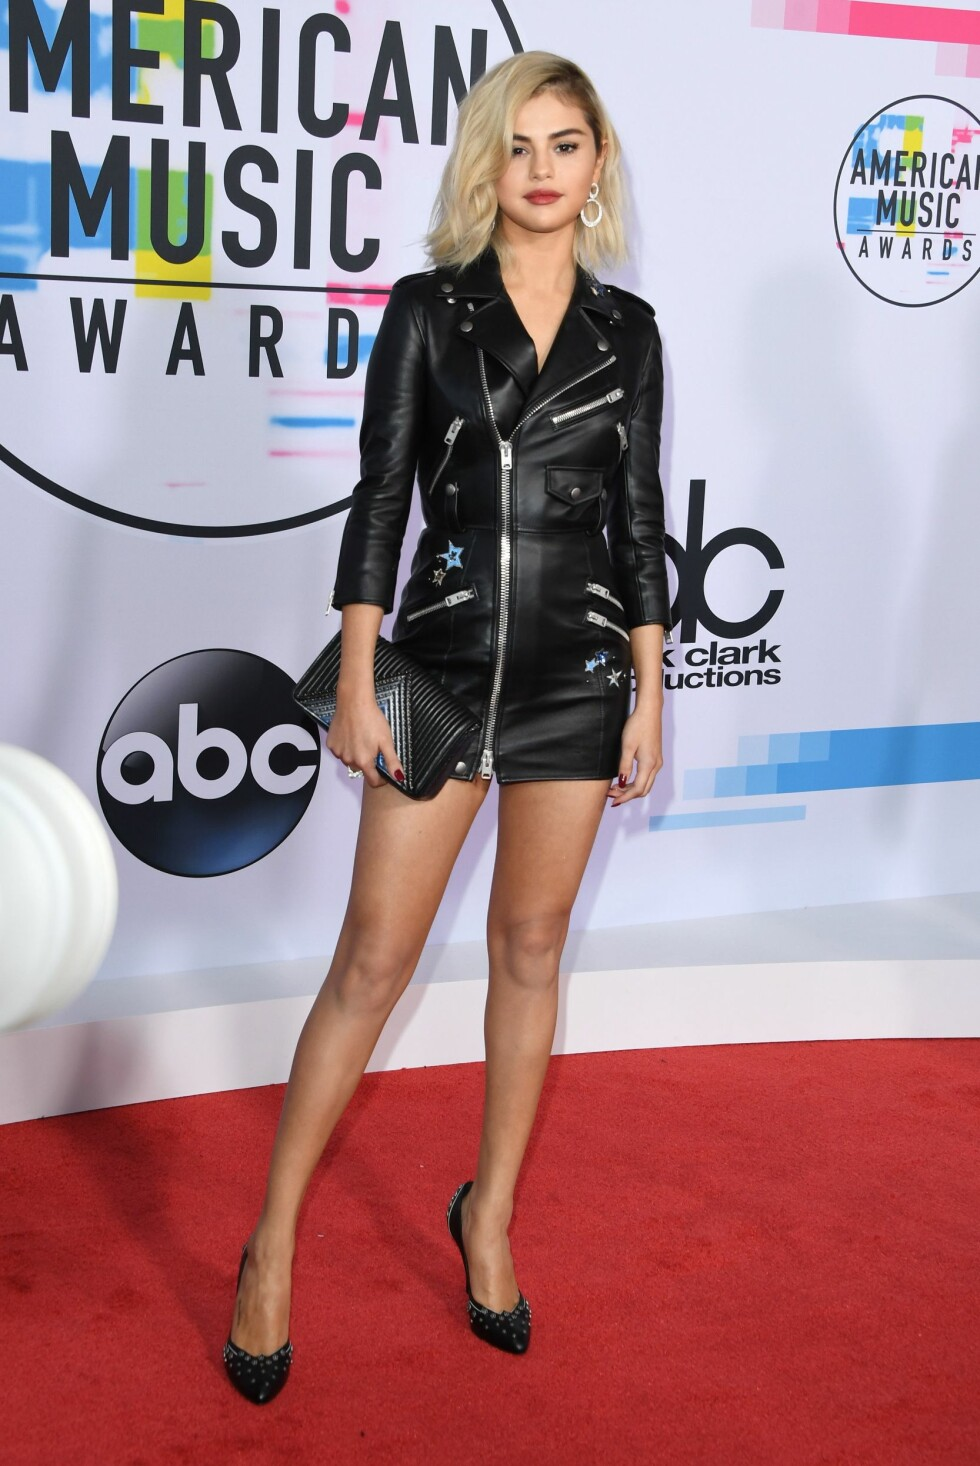 AMERICAN MUSIC AWARDS: Selena Gomez